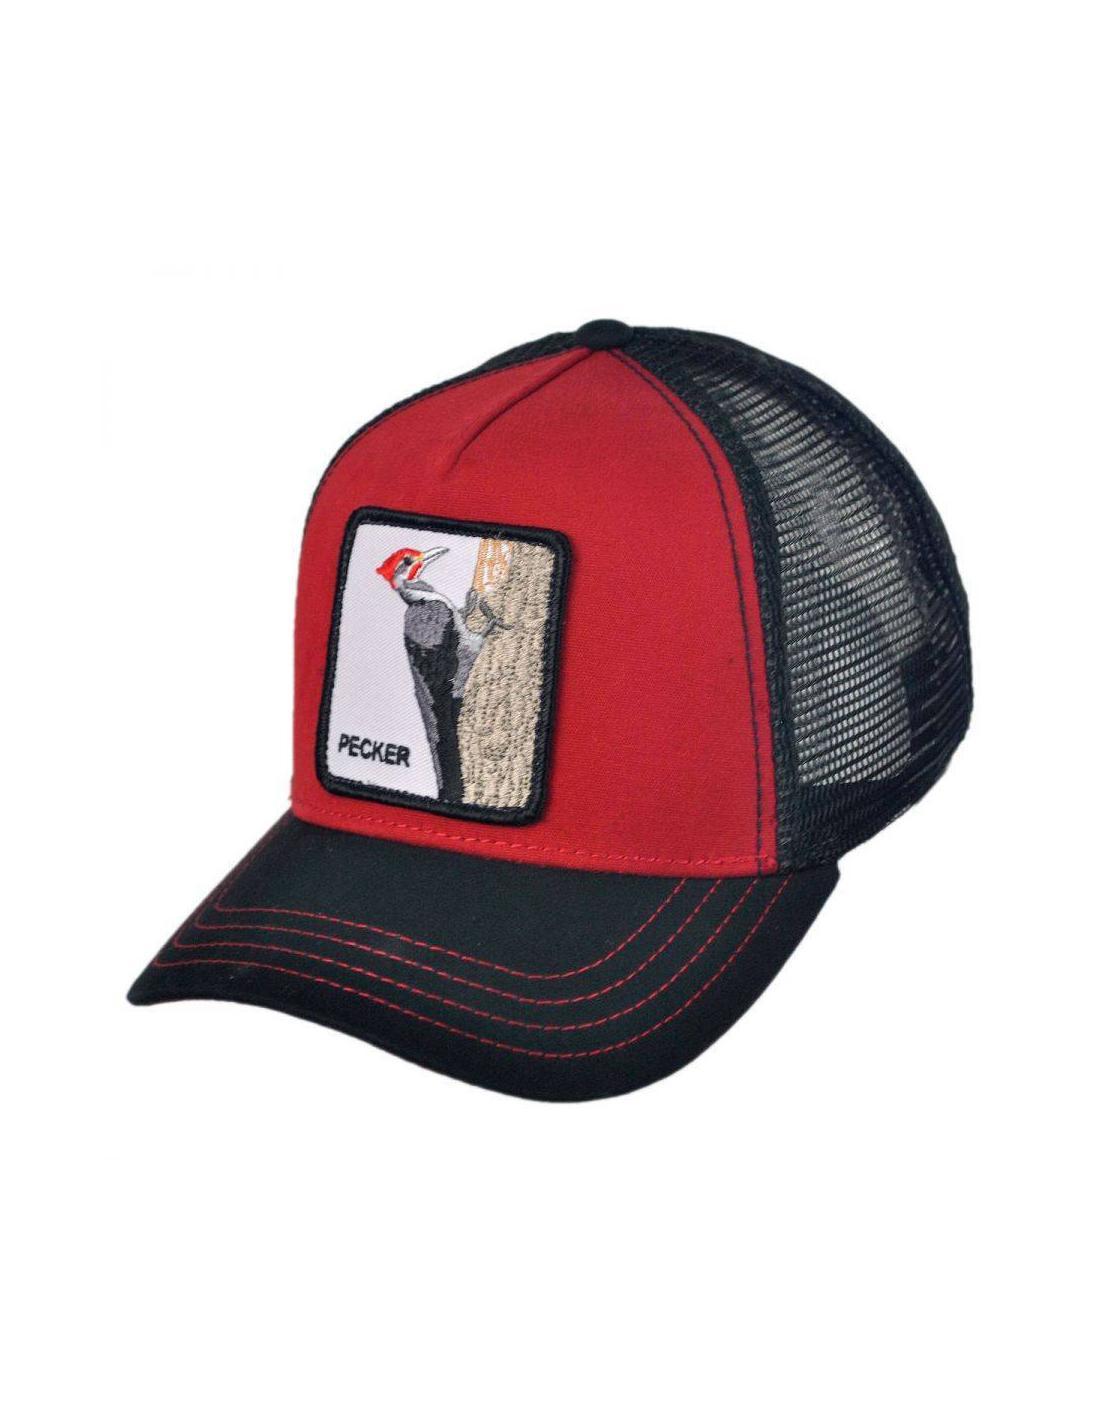 42aabf459df Goorin Bros Animal Farm Trucker Hat Woody Wood Red